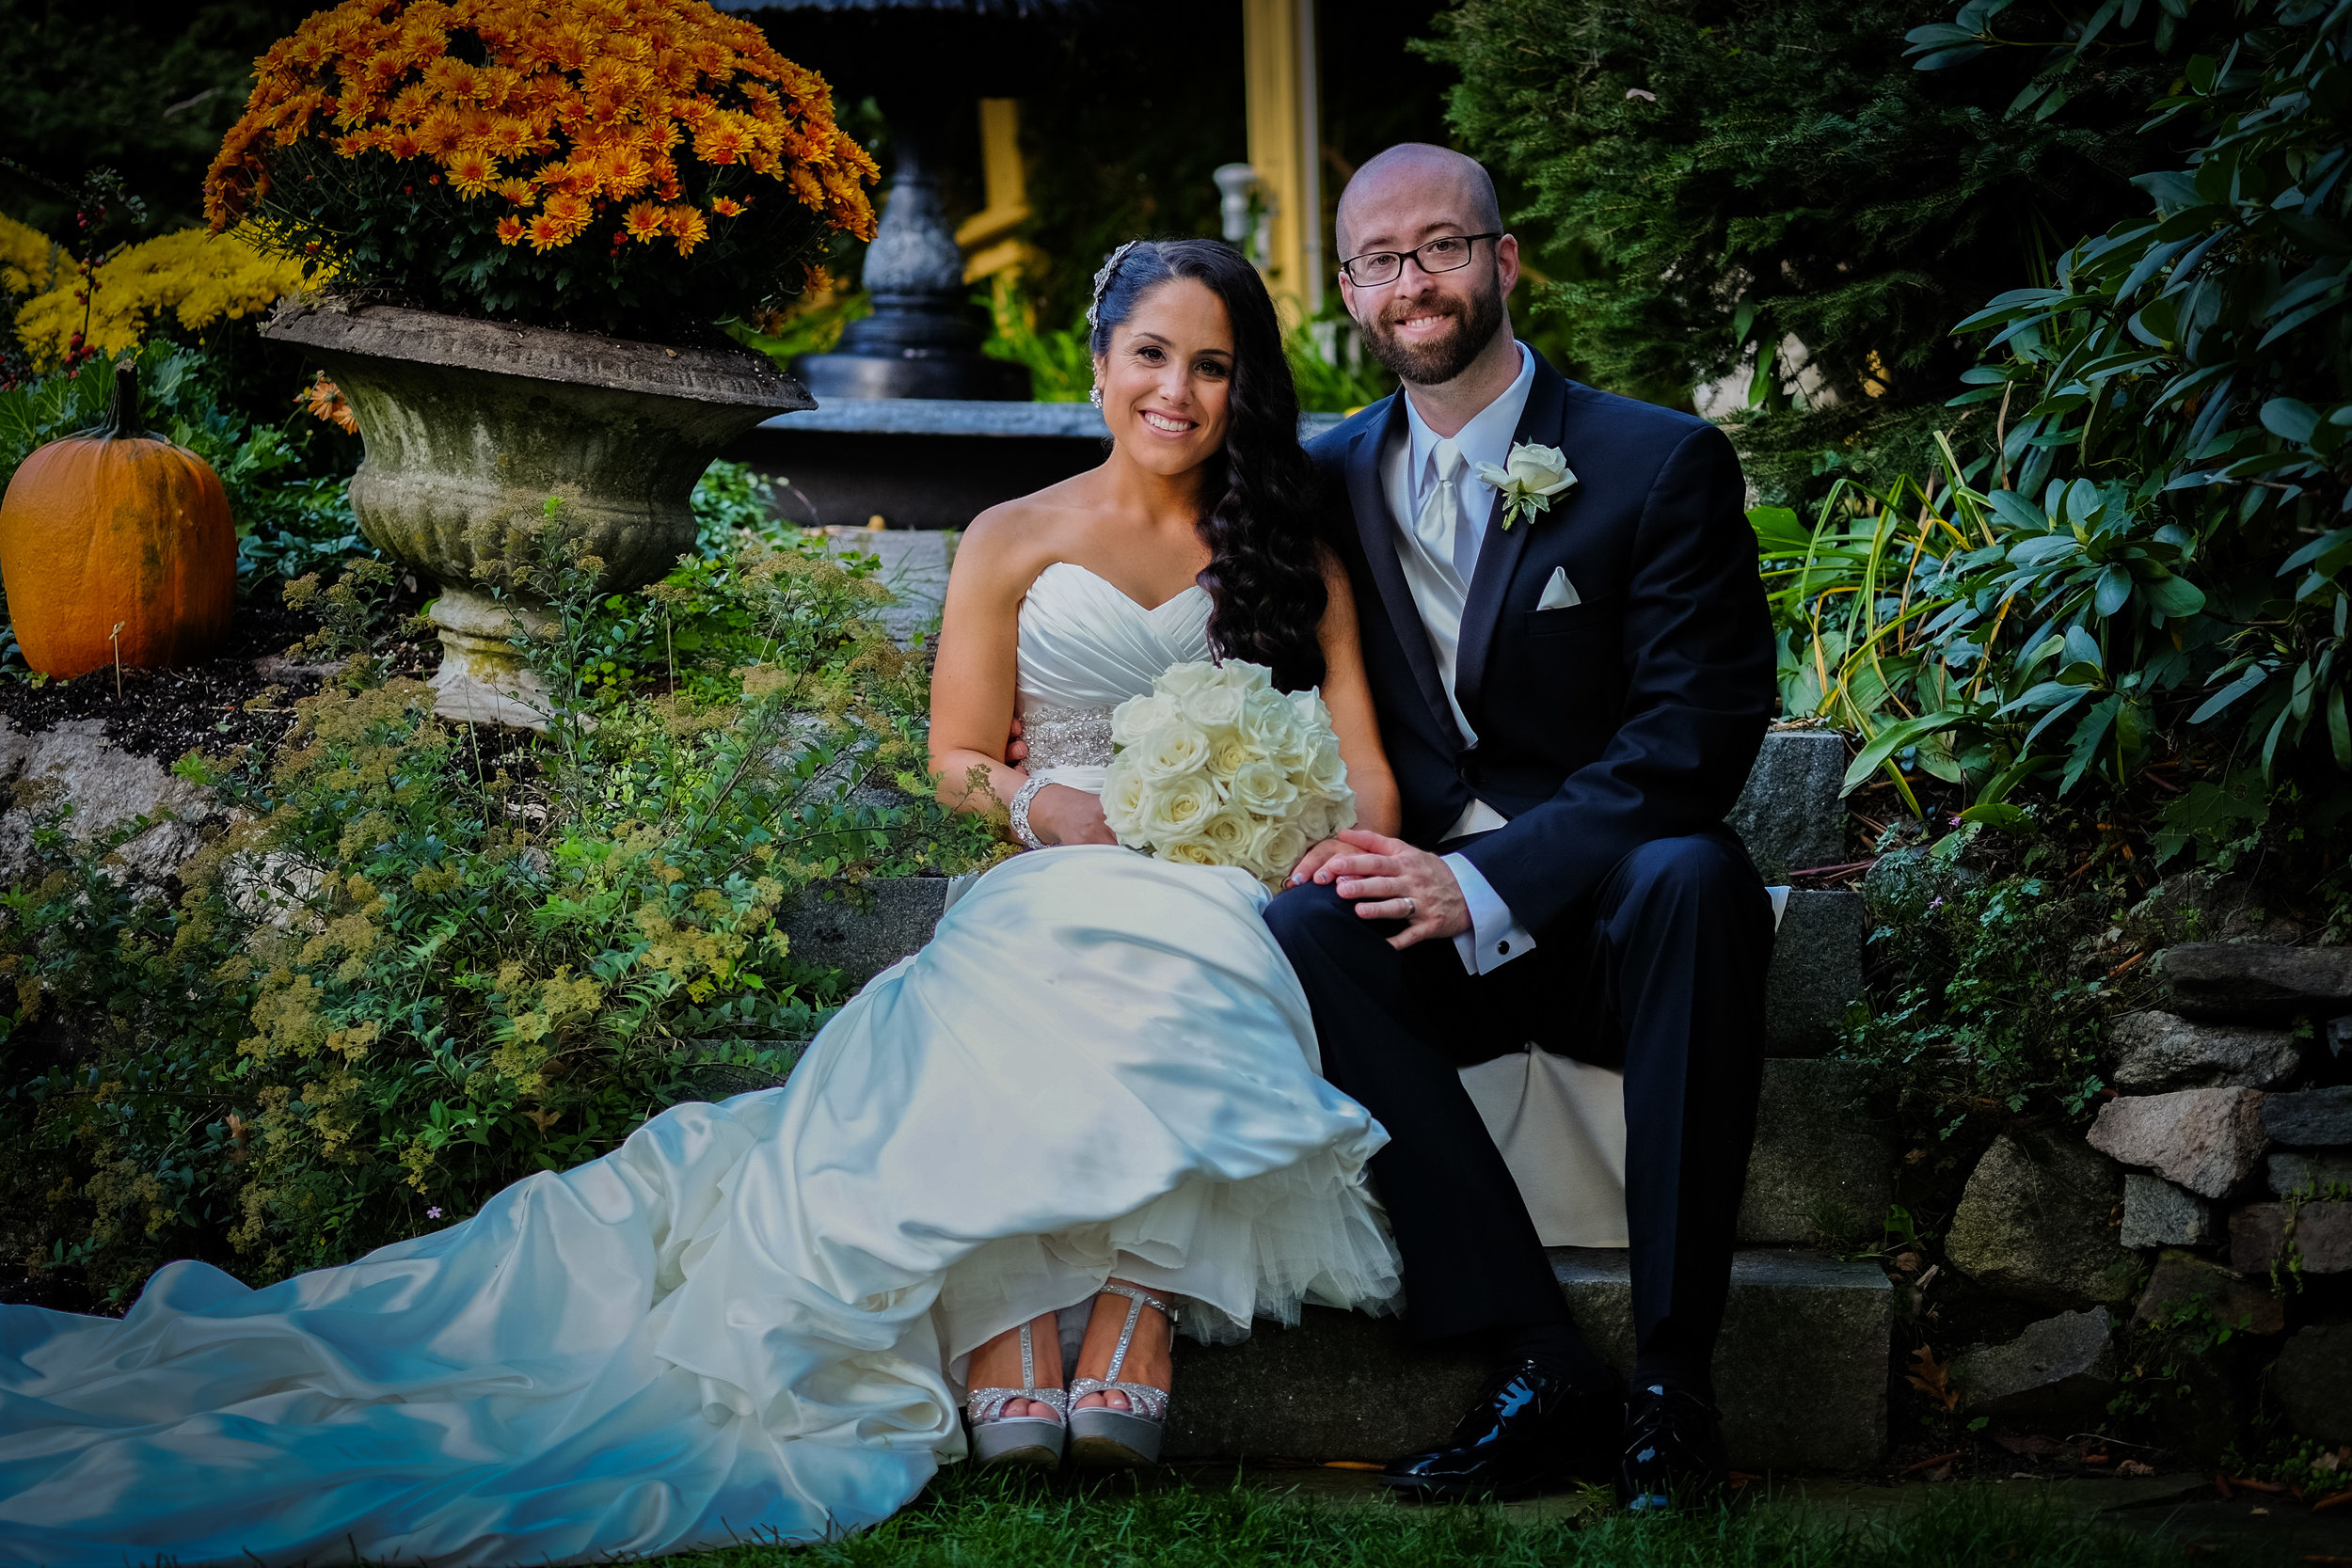 bedford-nh-wedding-photography-474.jpg